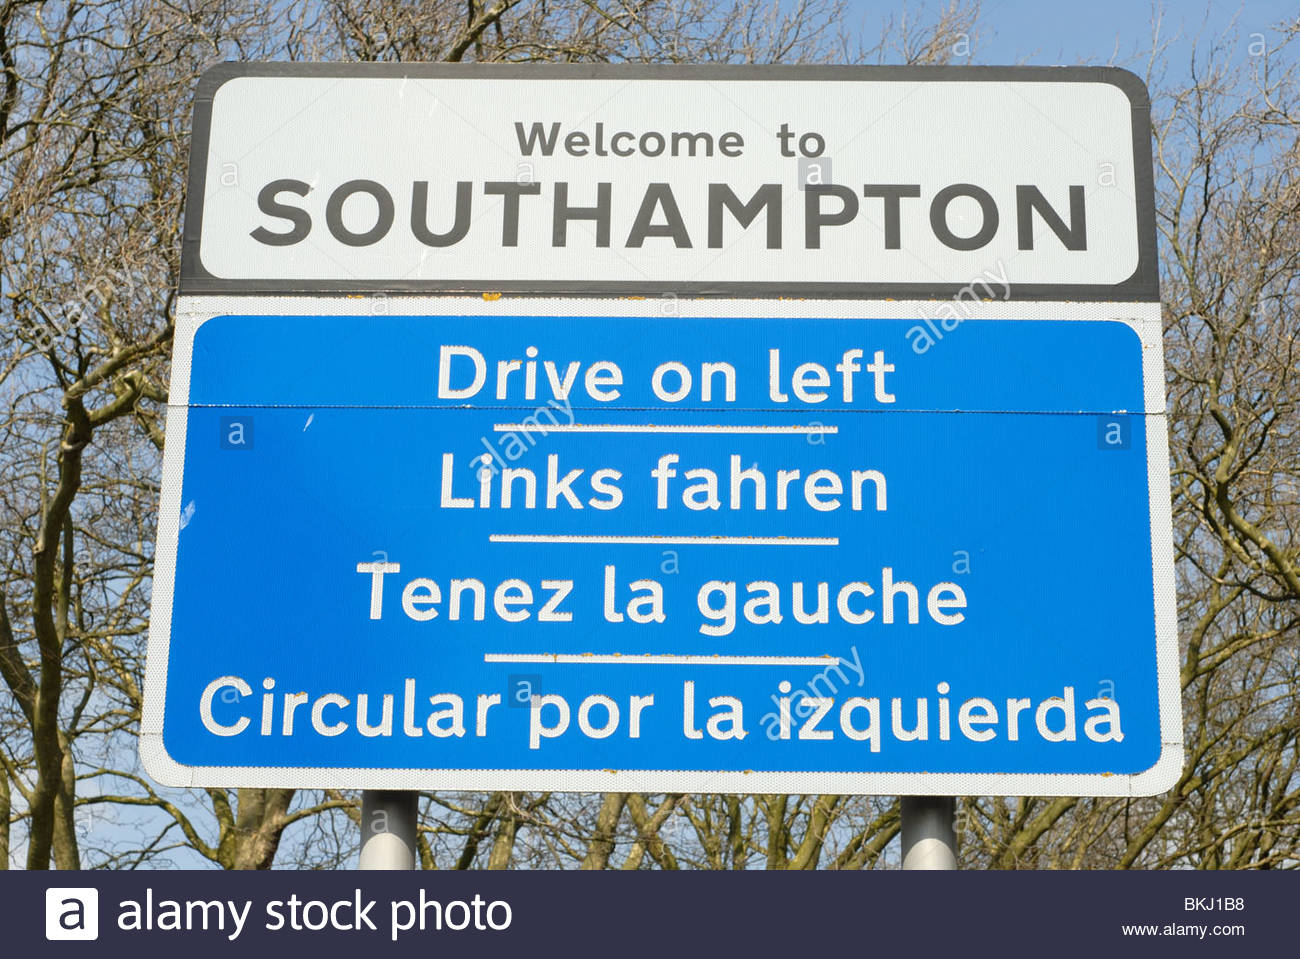 Southampton UK: Sign: Welcome to Southampton - Drive on left. - Stock Image